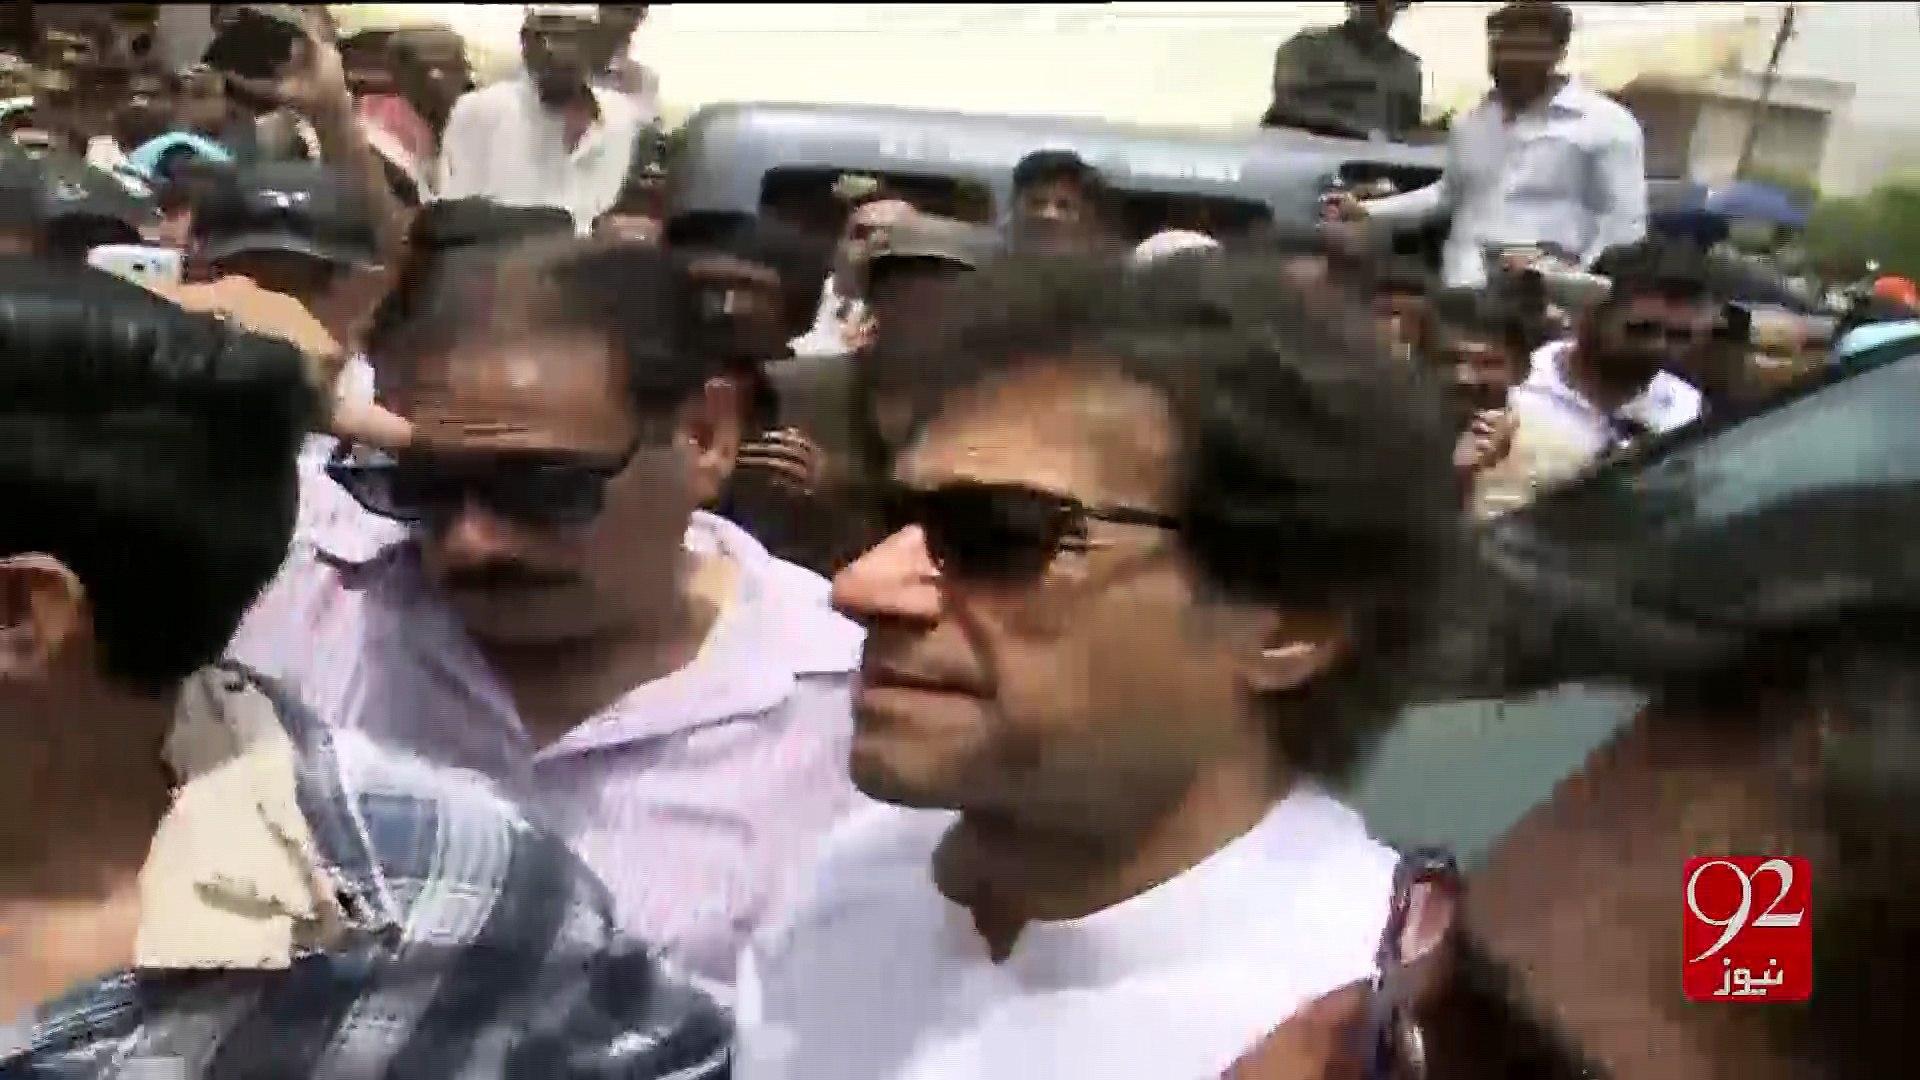 Imran Khan to visit Karachi on a three-day visit 29-12-2016 - 92NewsHD